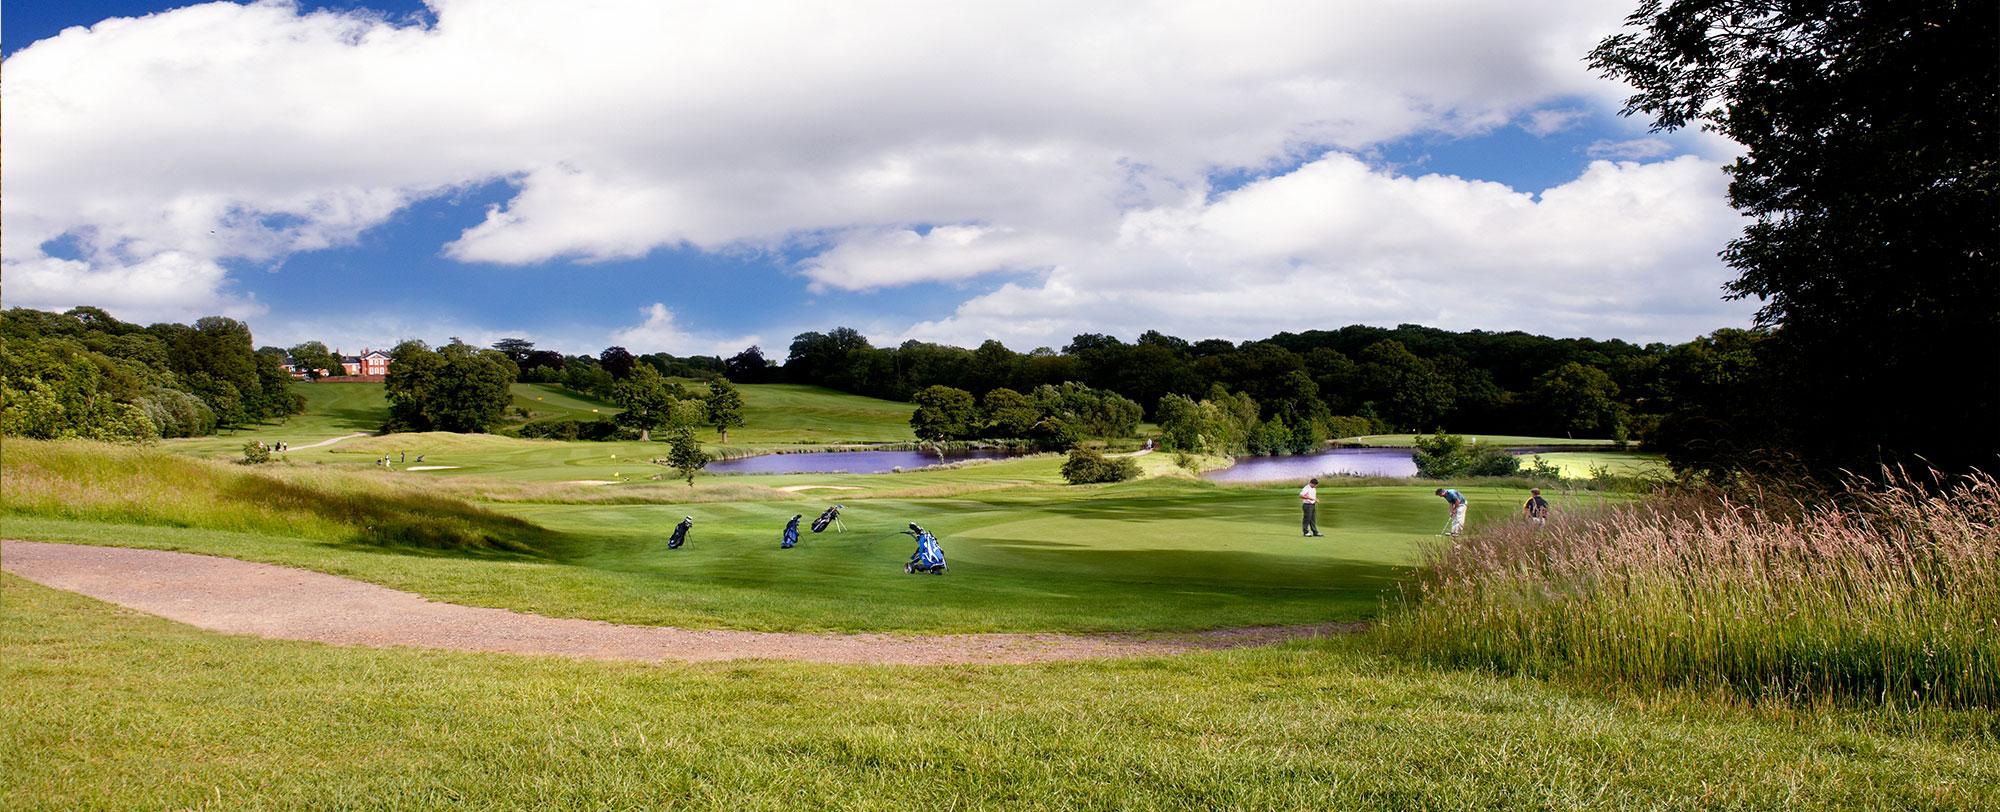 Golf-Top.jpg